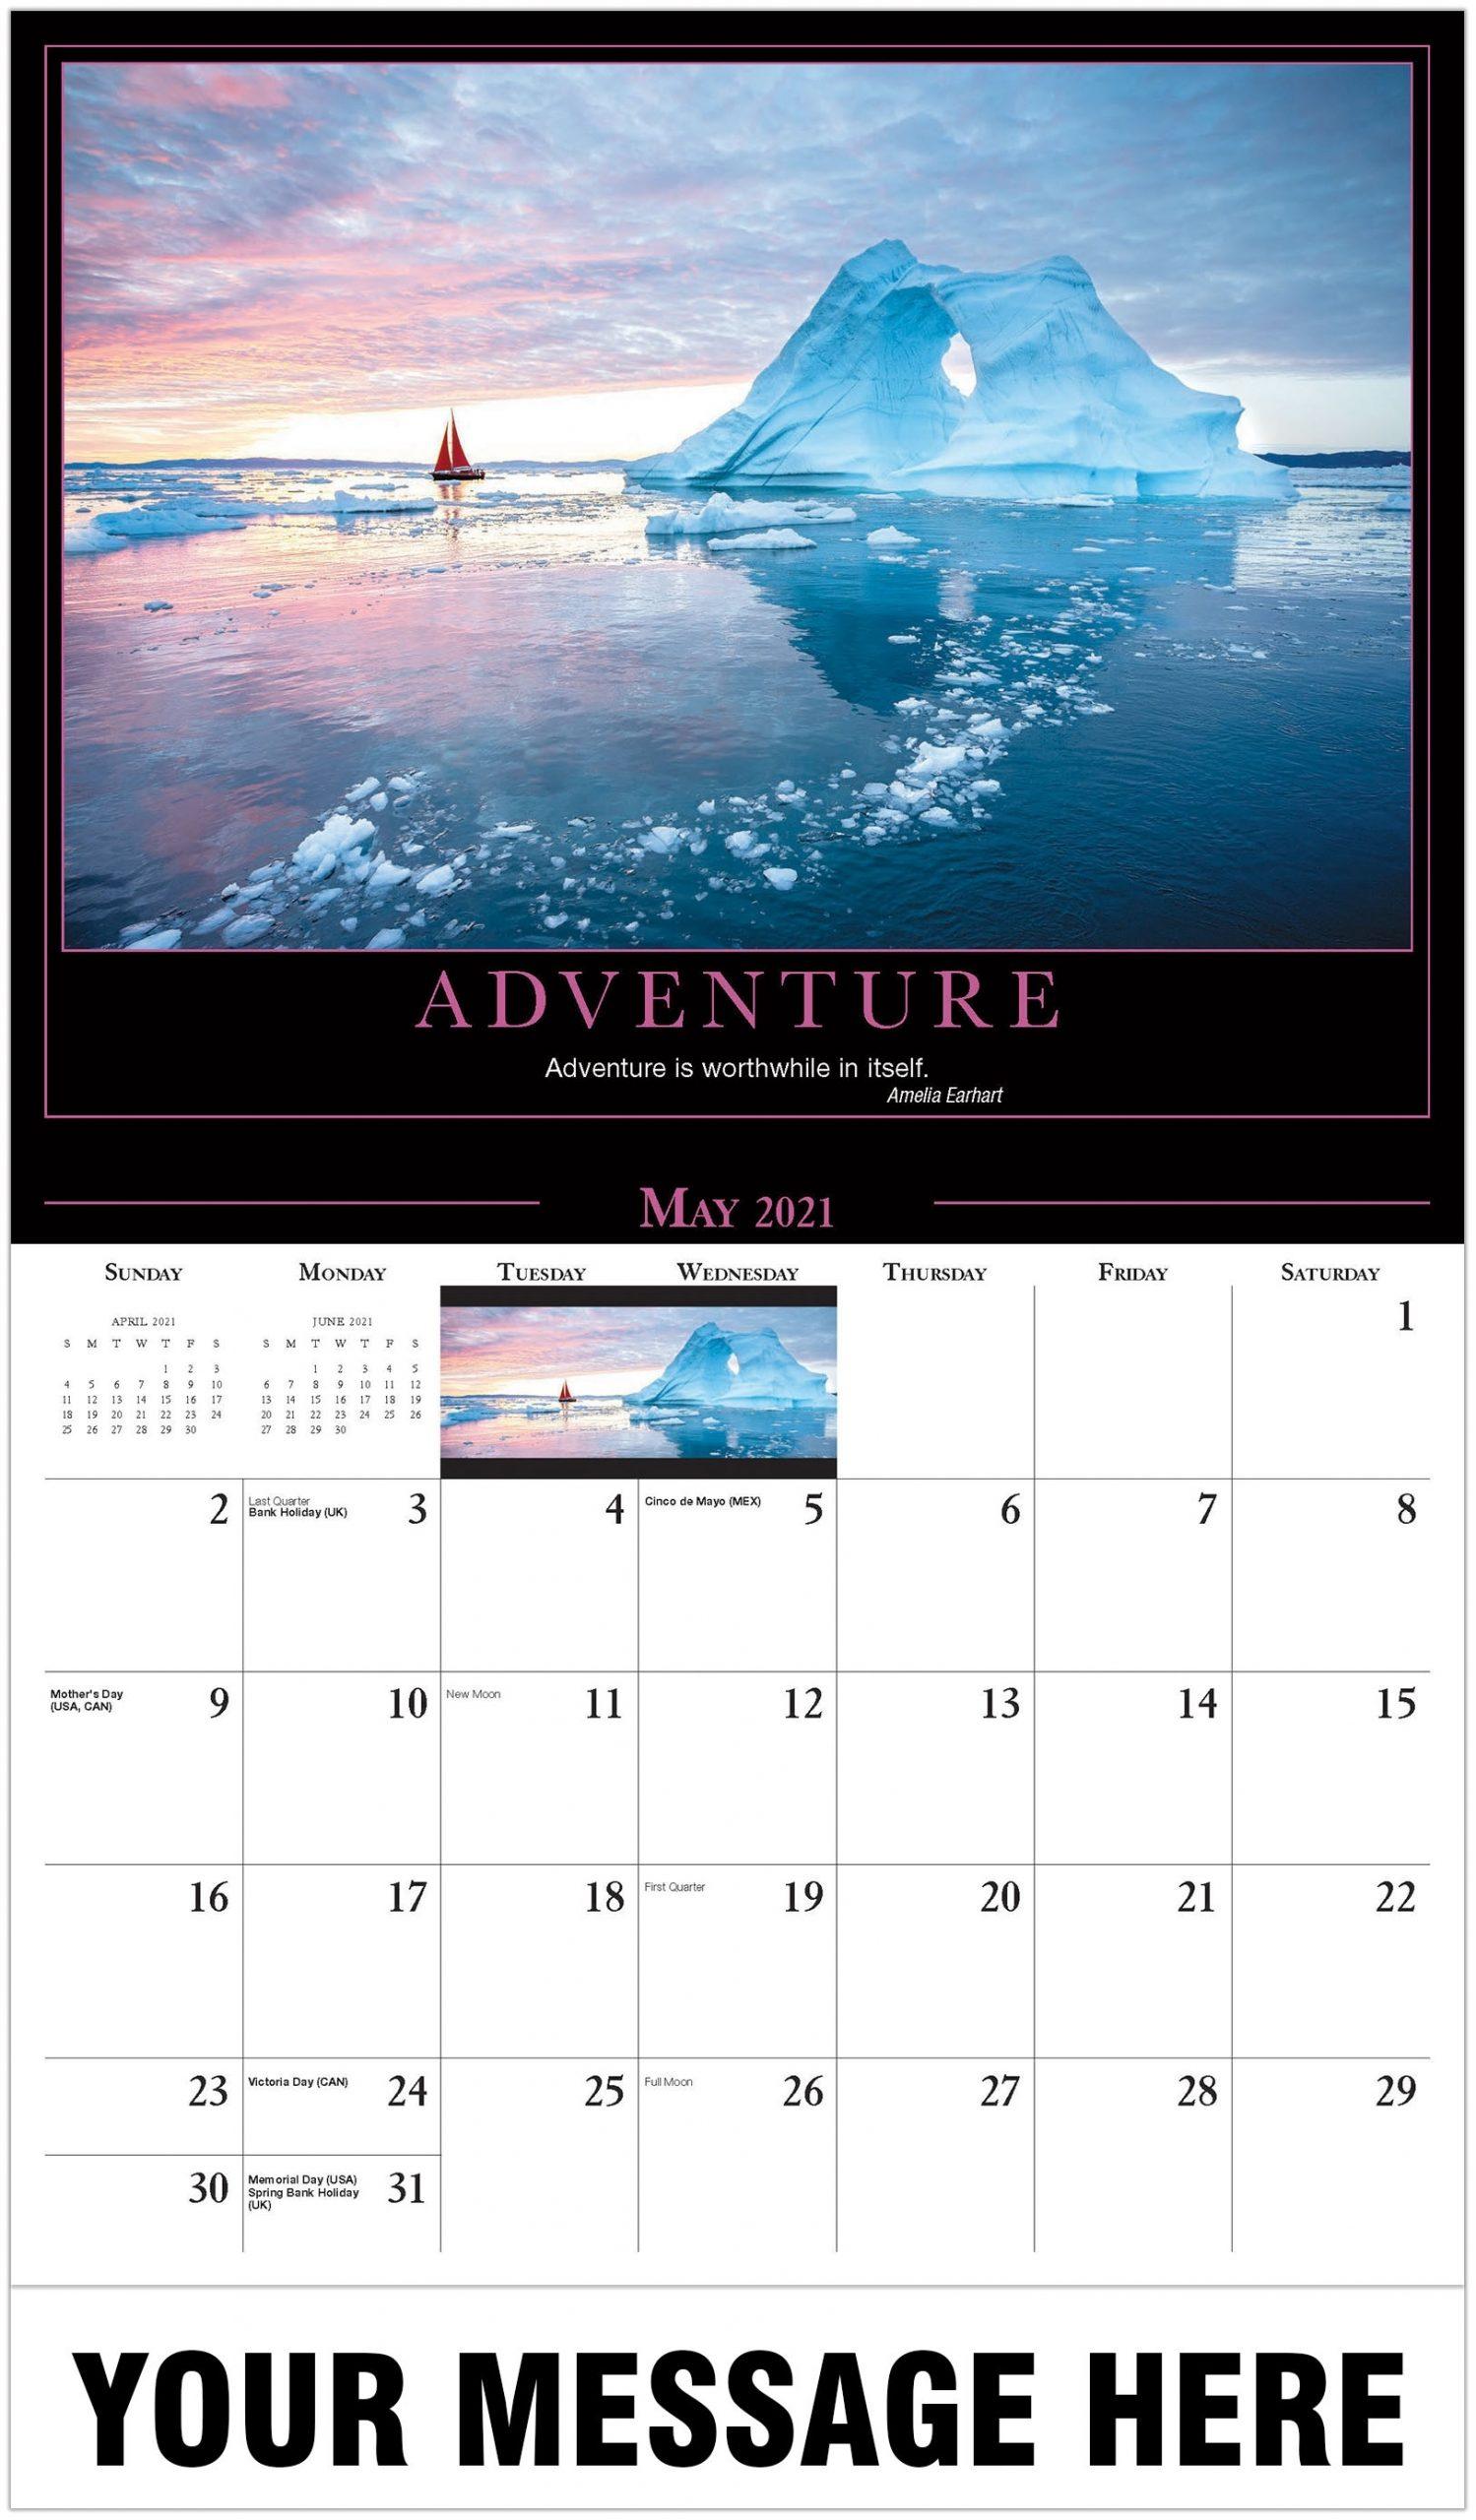 Motivational Quotes Calendar | 2021 Promotional Calendar